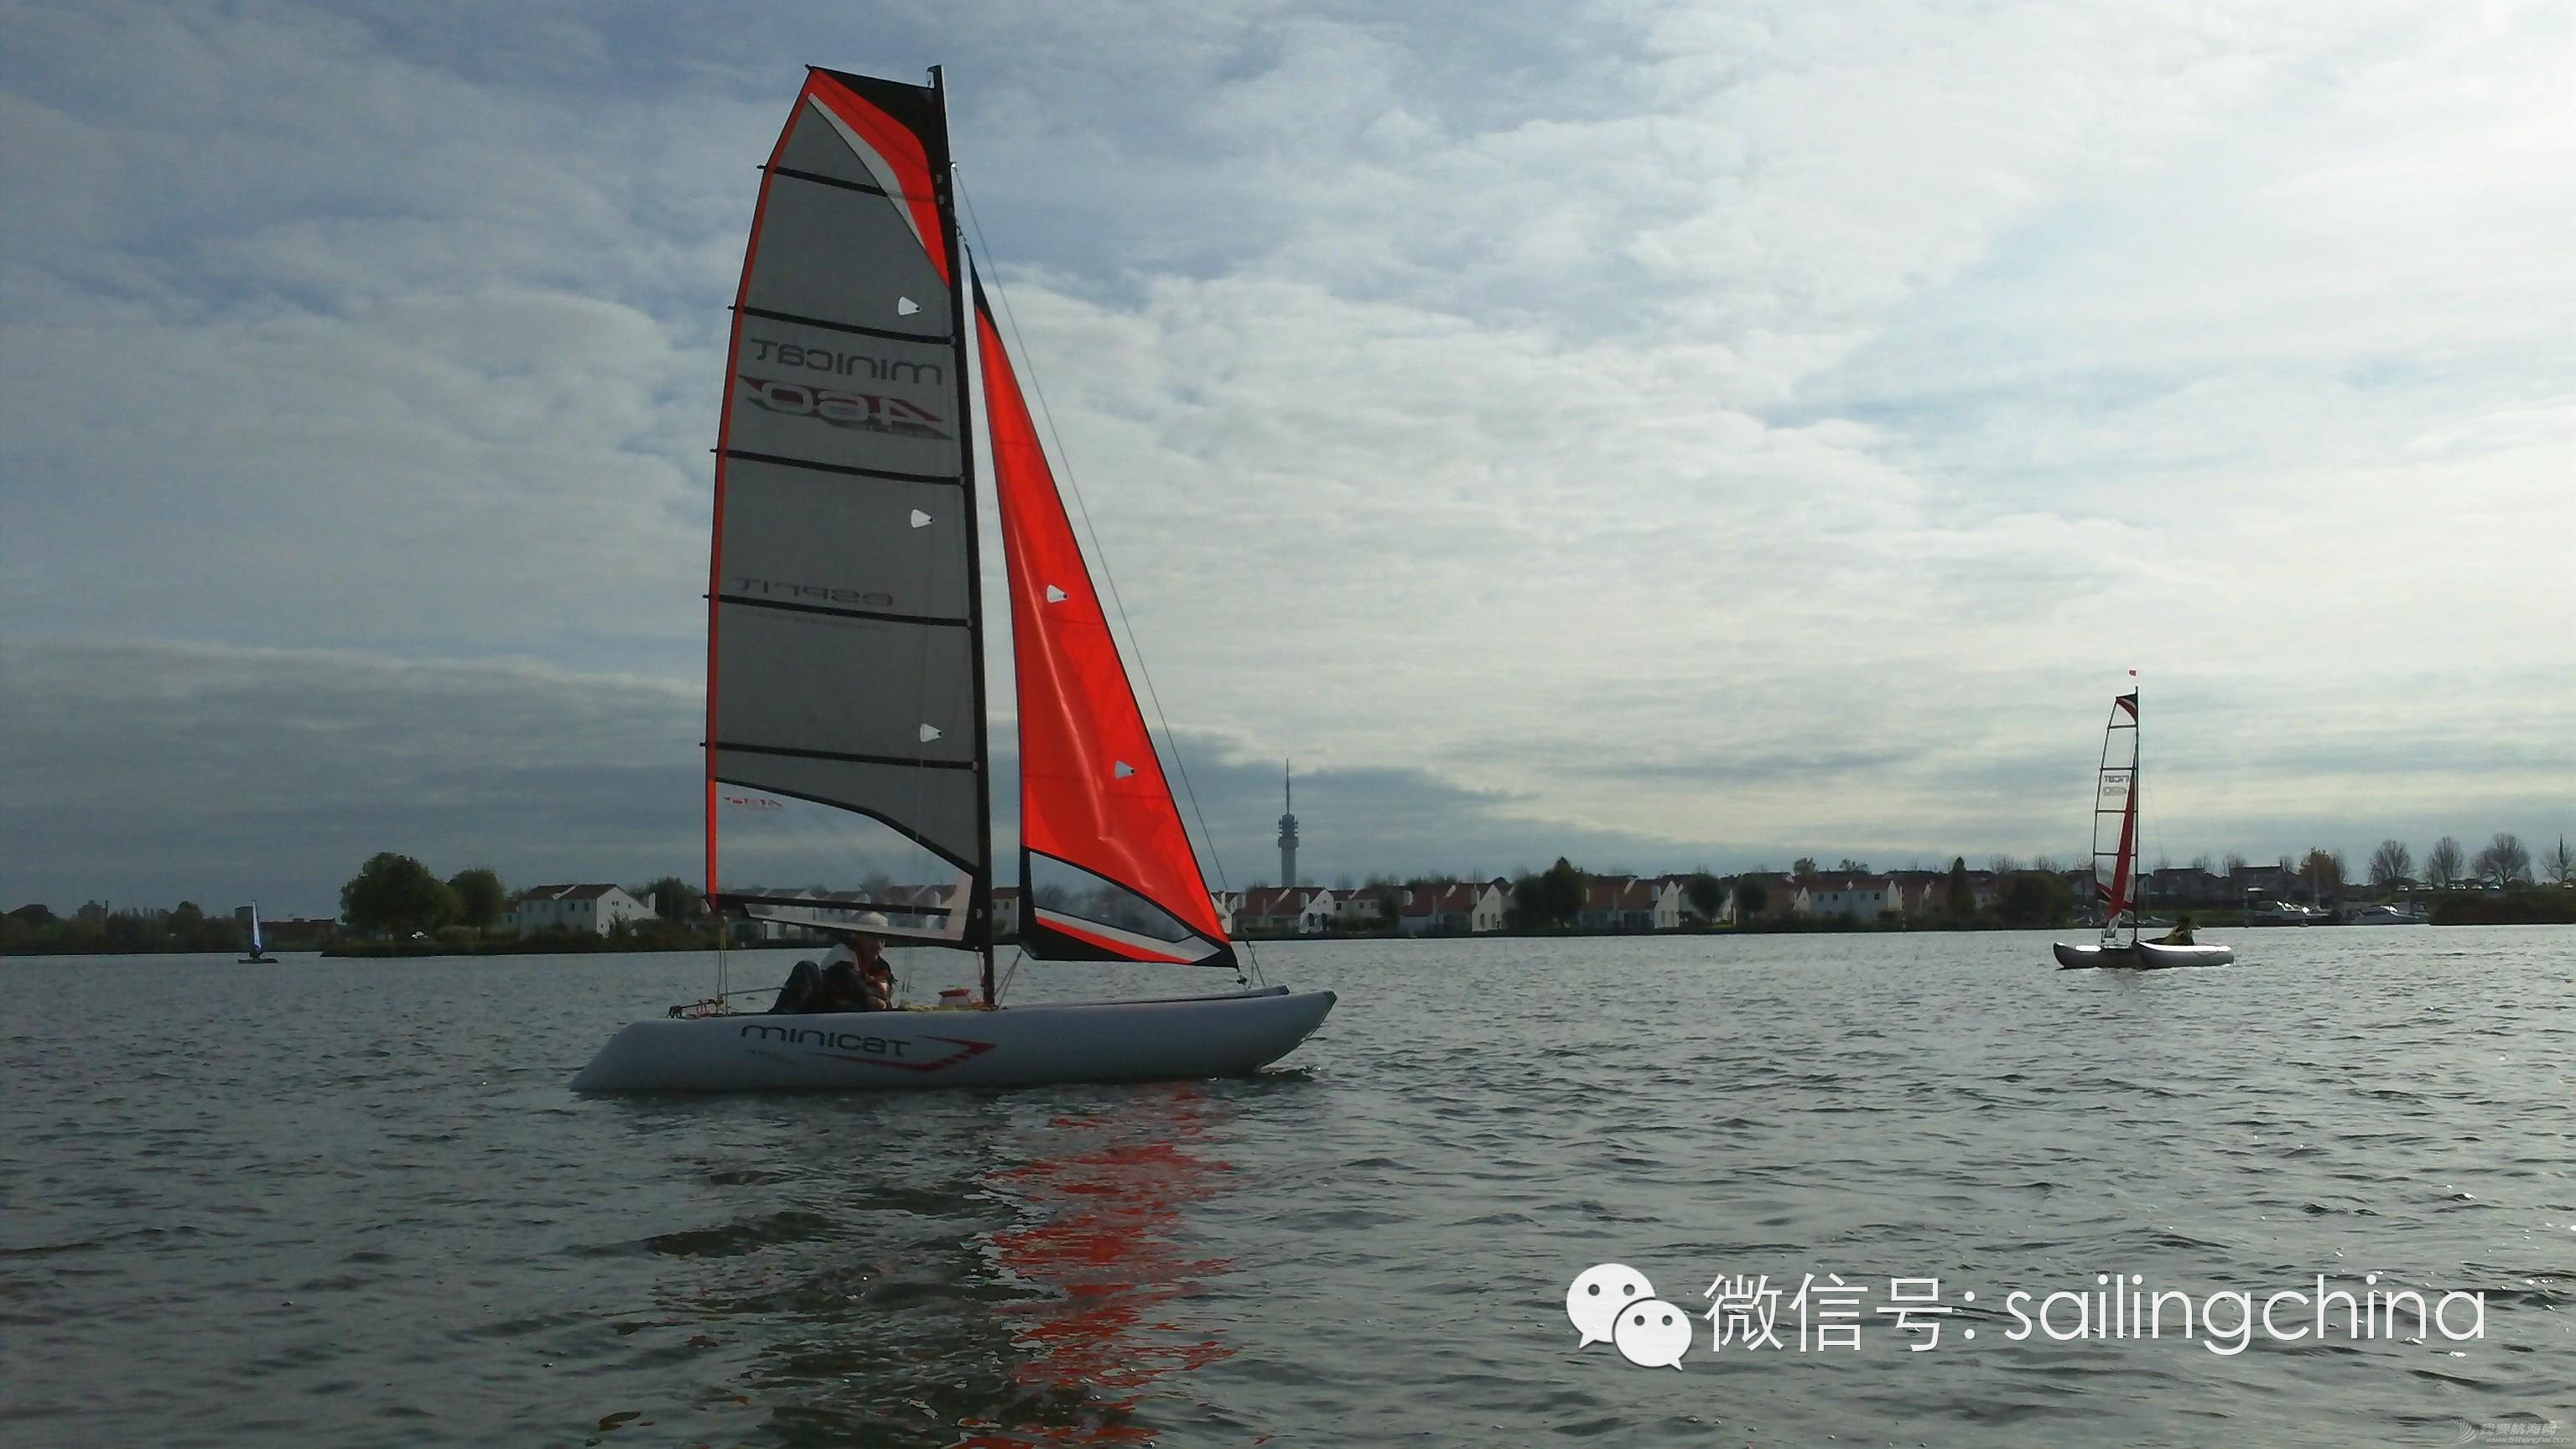 MINICAT充气式双体帆船各系列介绍 cdeb291778fdda7d498781d9f2f7ef34.jpg